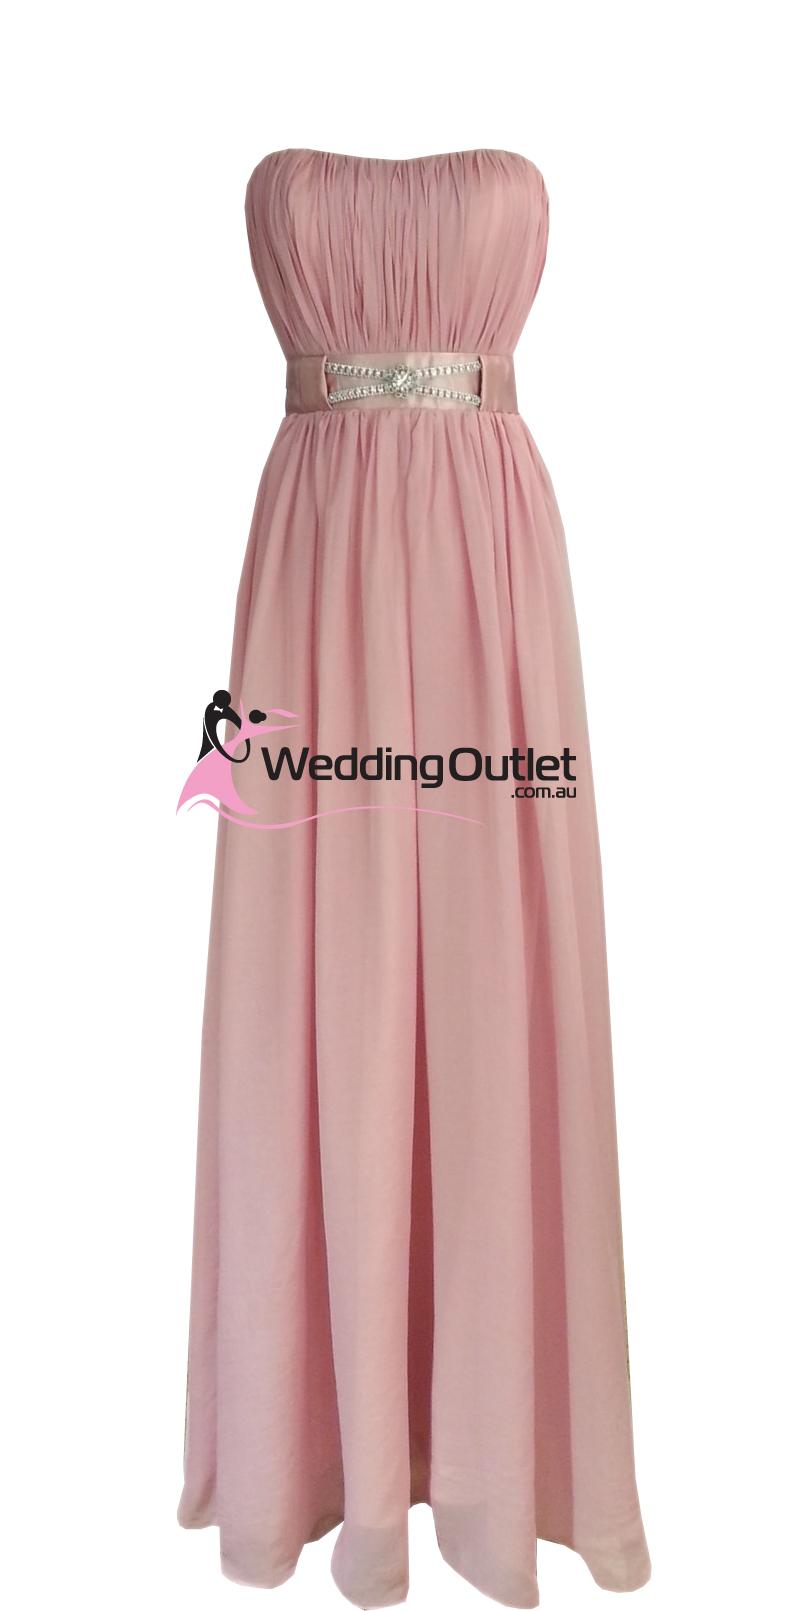 wedding colored dresses photo - 1